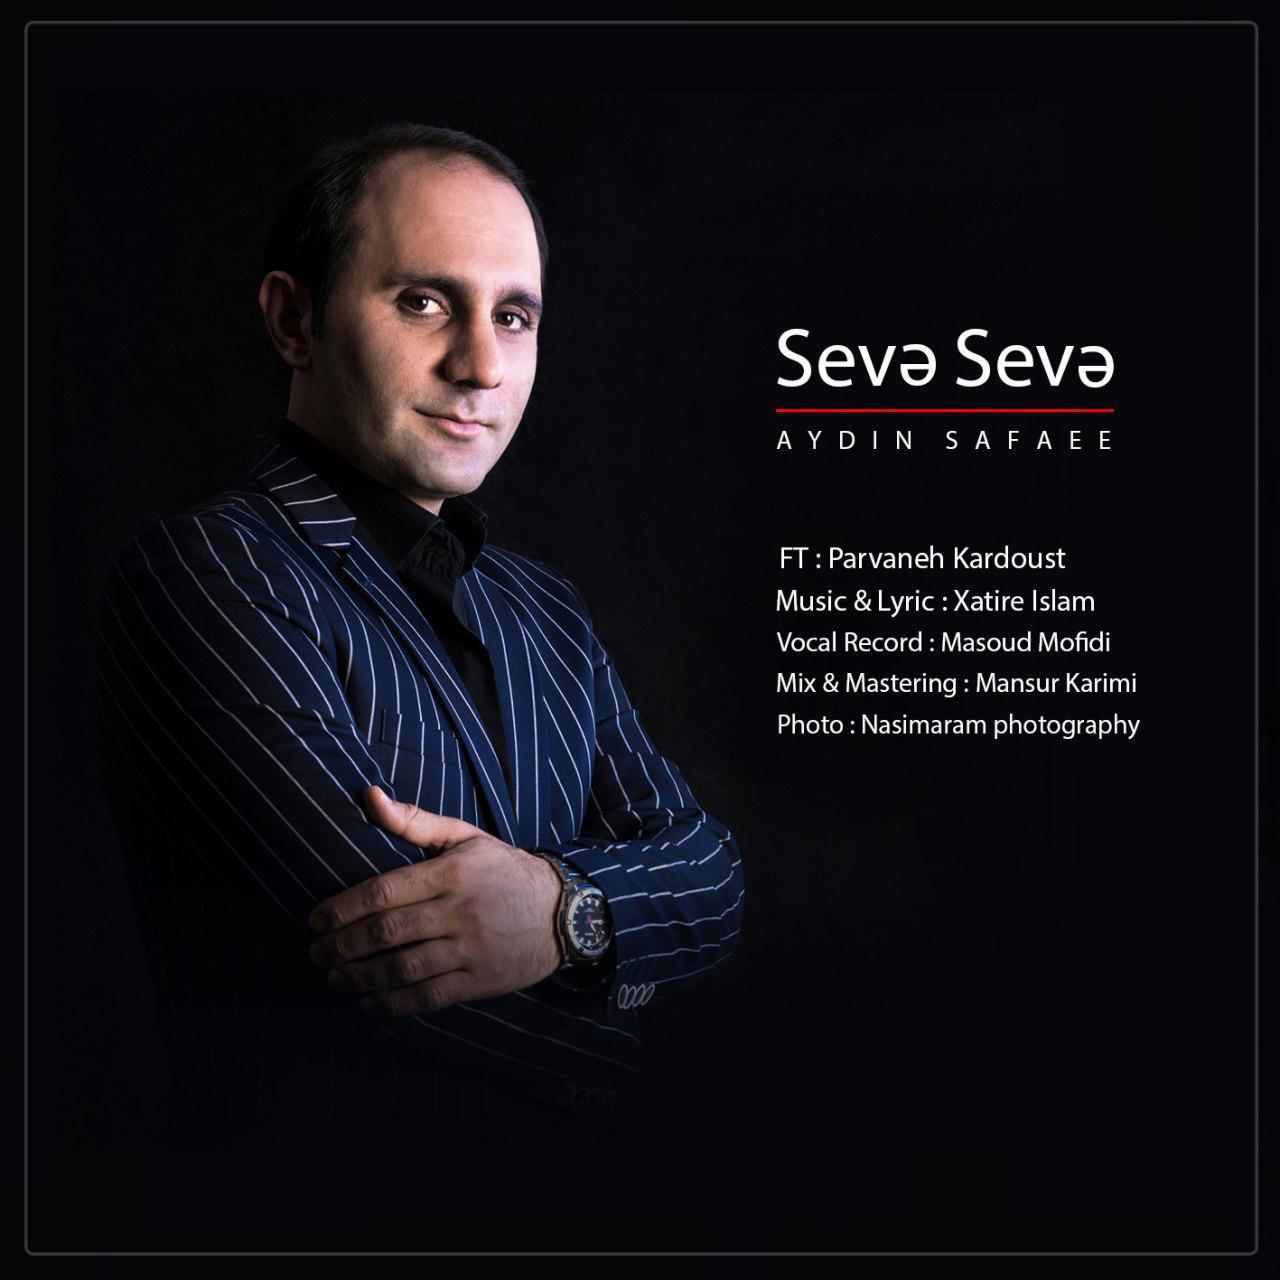 http://birtunes.ir/wp-content/uploads/2018/12/Aydin-Safaee-Seva-Seva.jpg